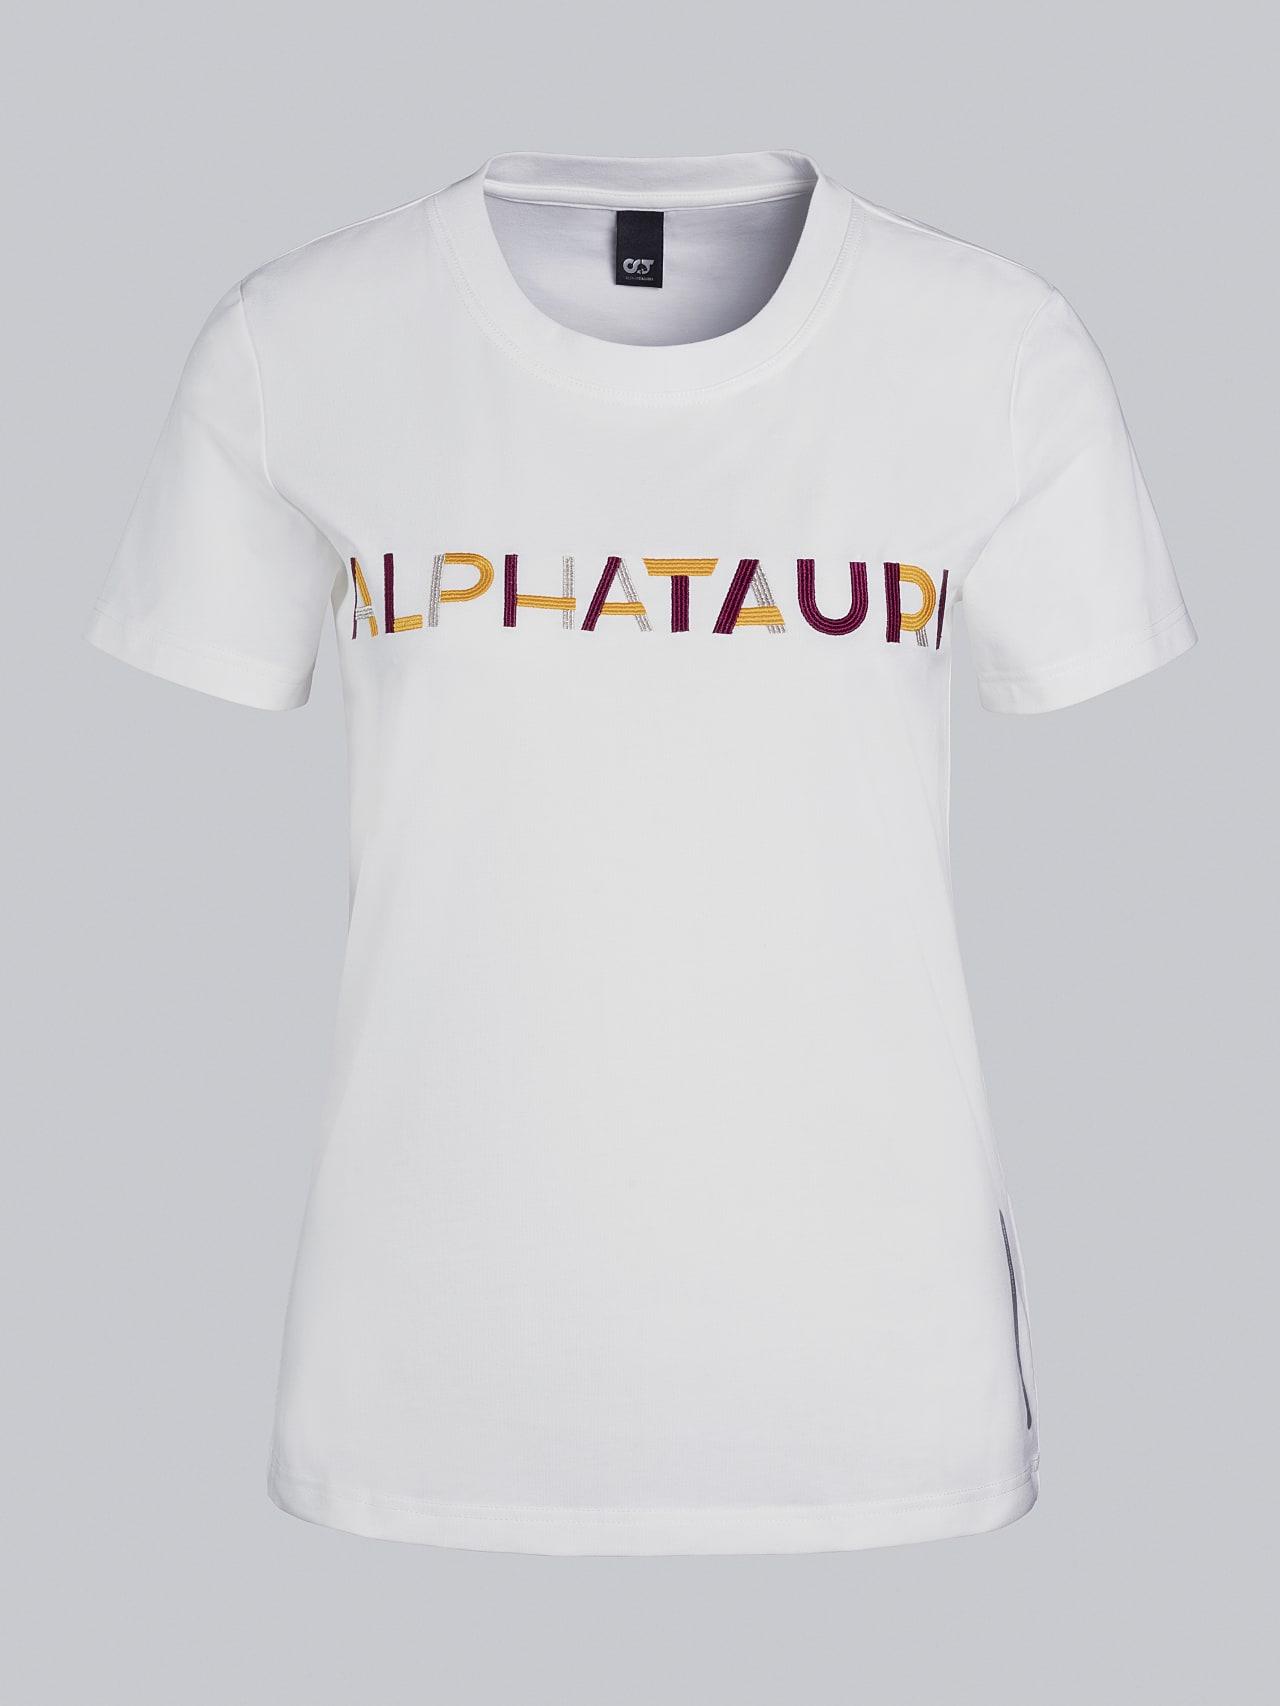 JOCTI V3.Y5.02 Logo T-Shirt offwhite Back Alpha Tauri